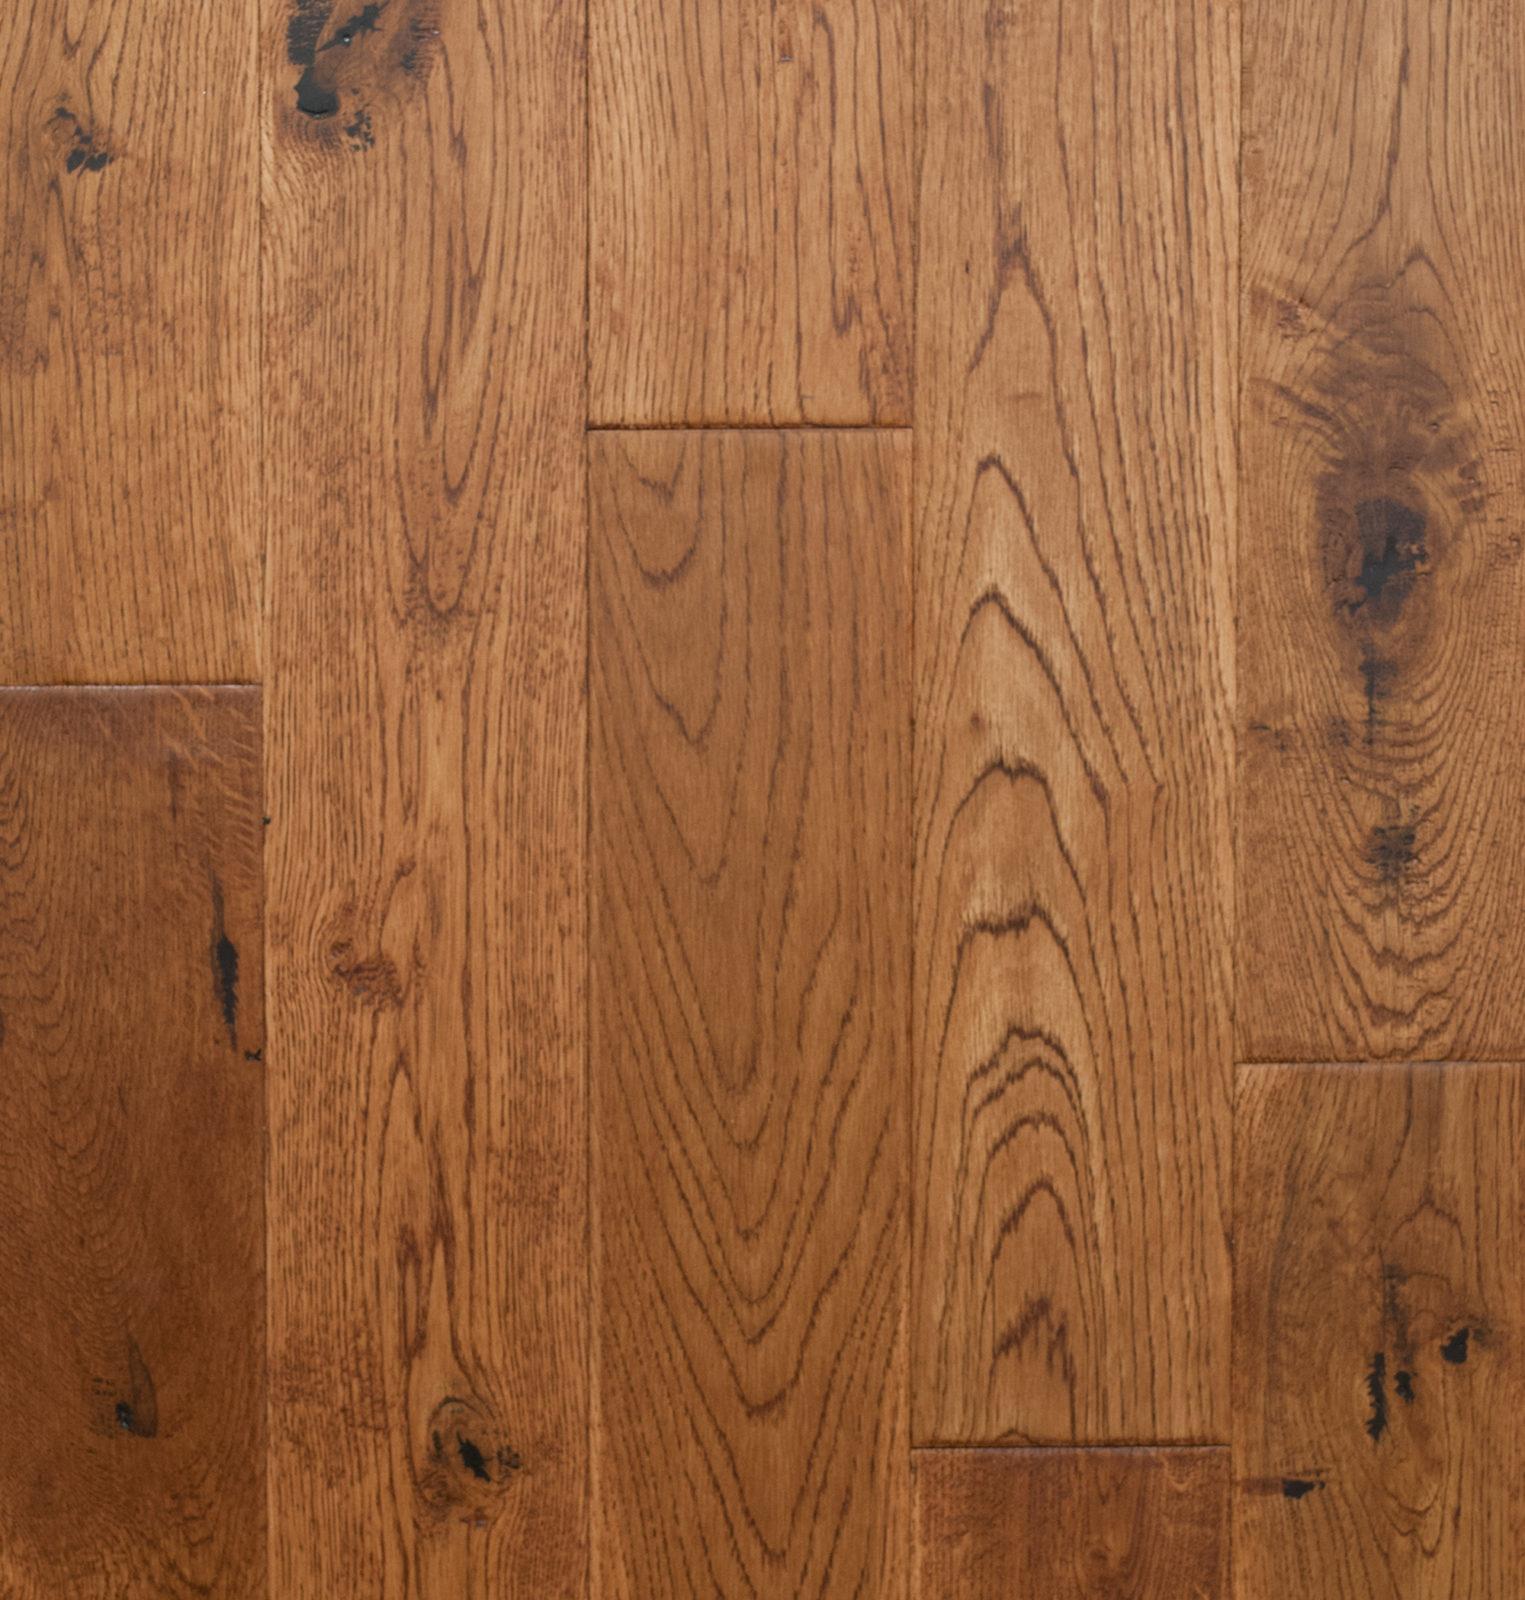 shop oak flooring selections hardwood style pd gunstock ft floors engineered sq in